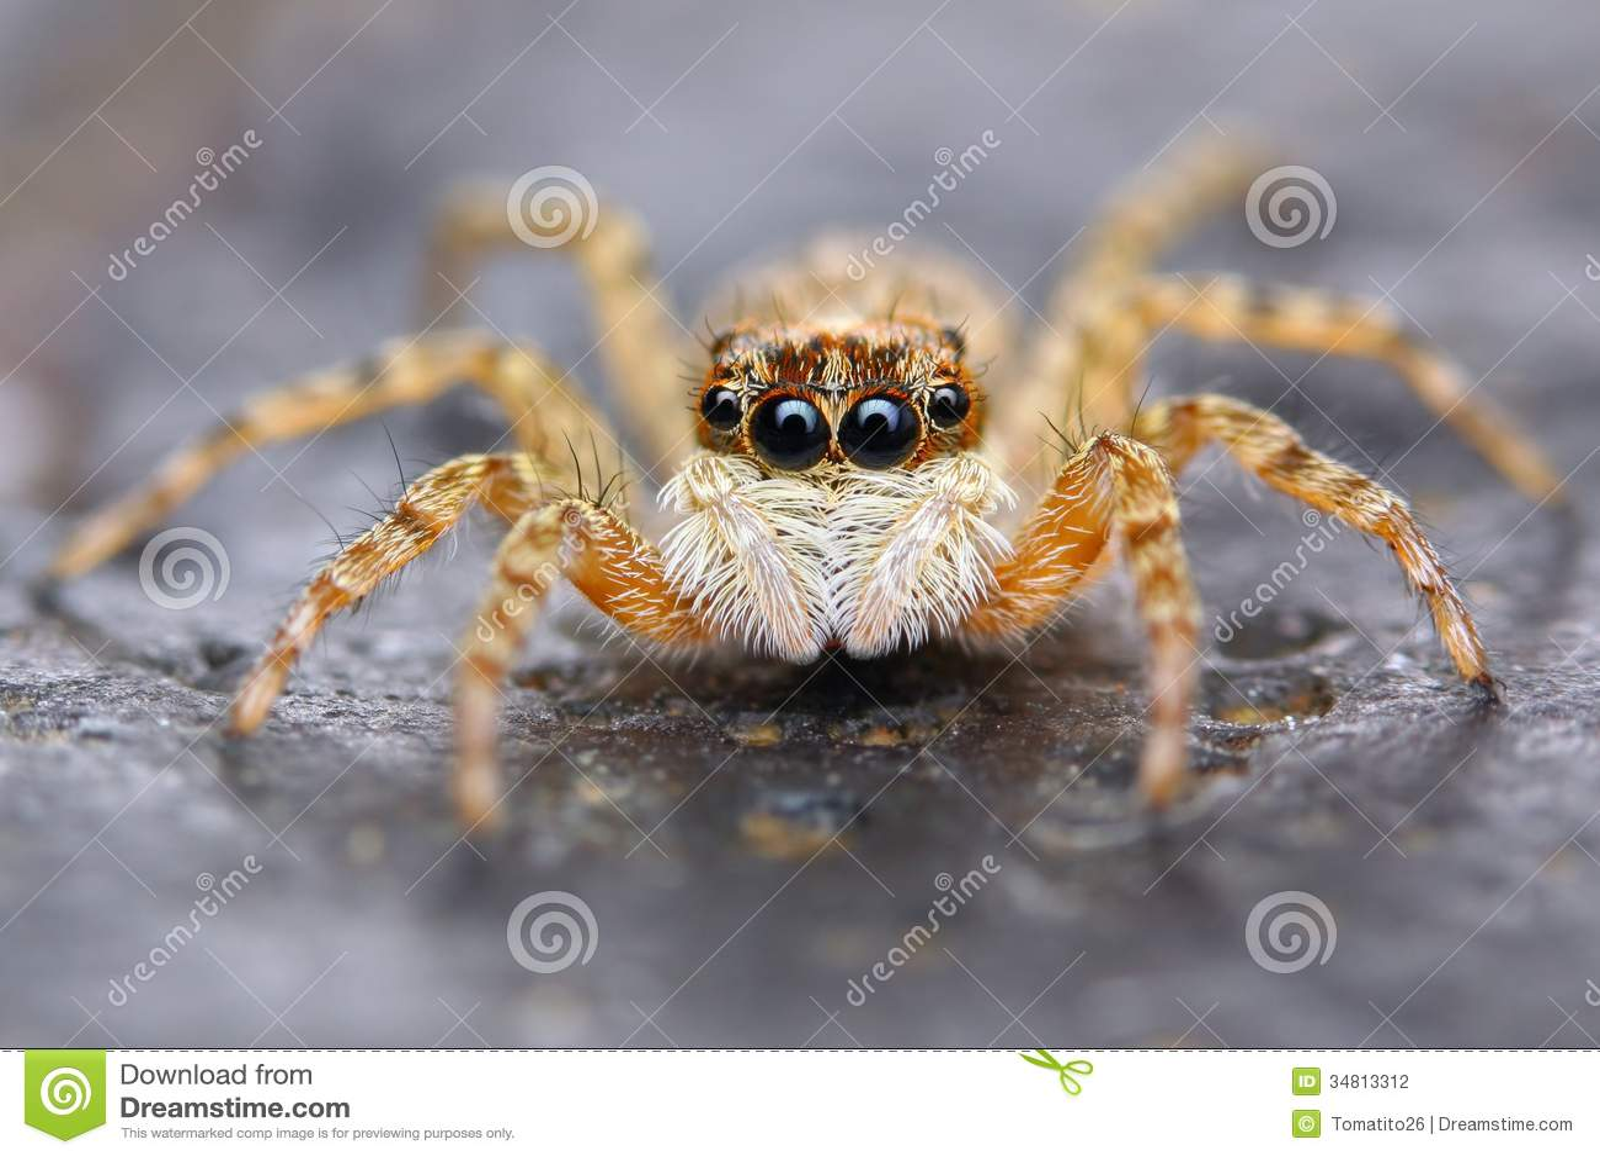 little spanish jumping spider